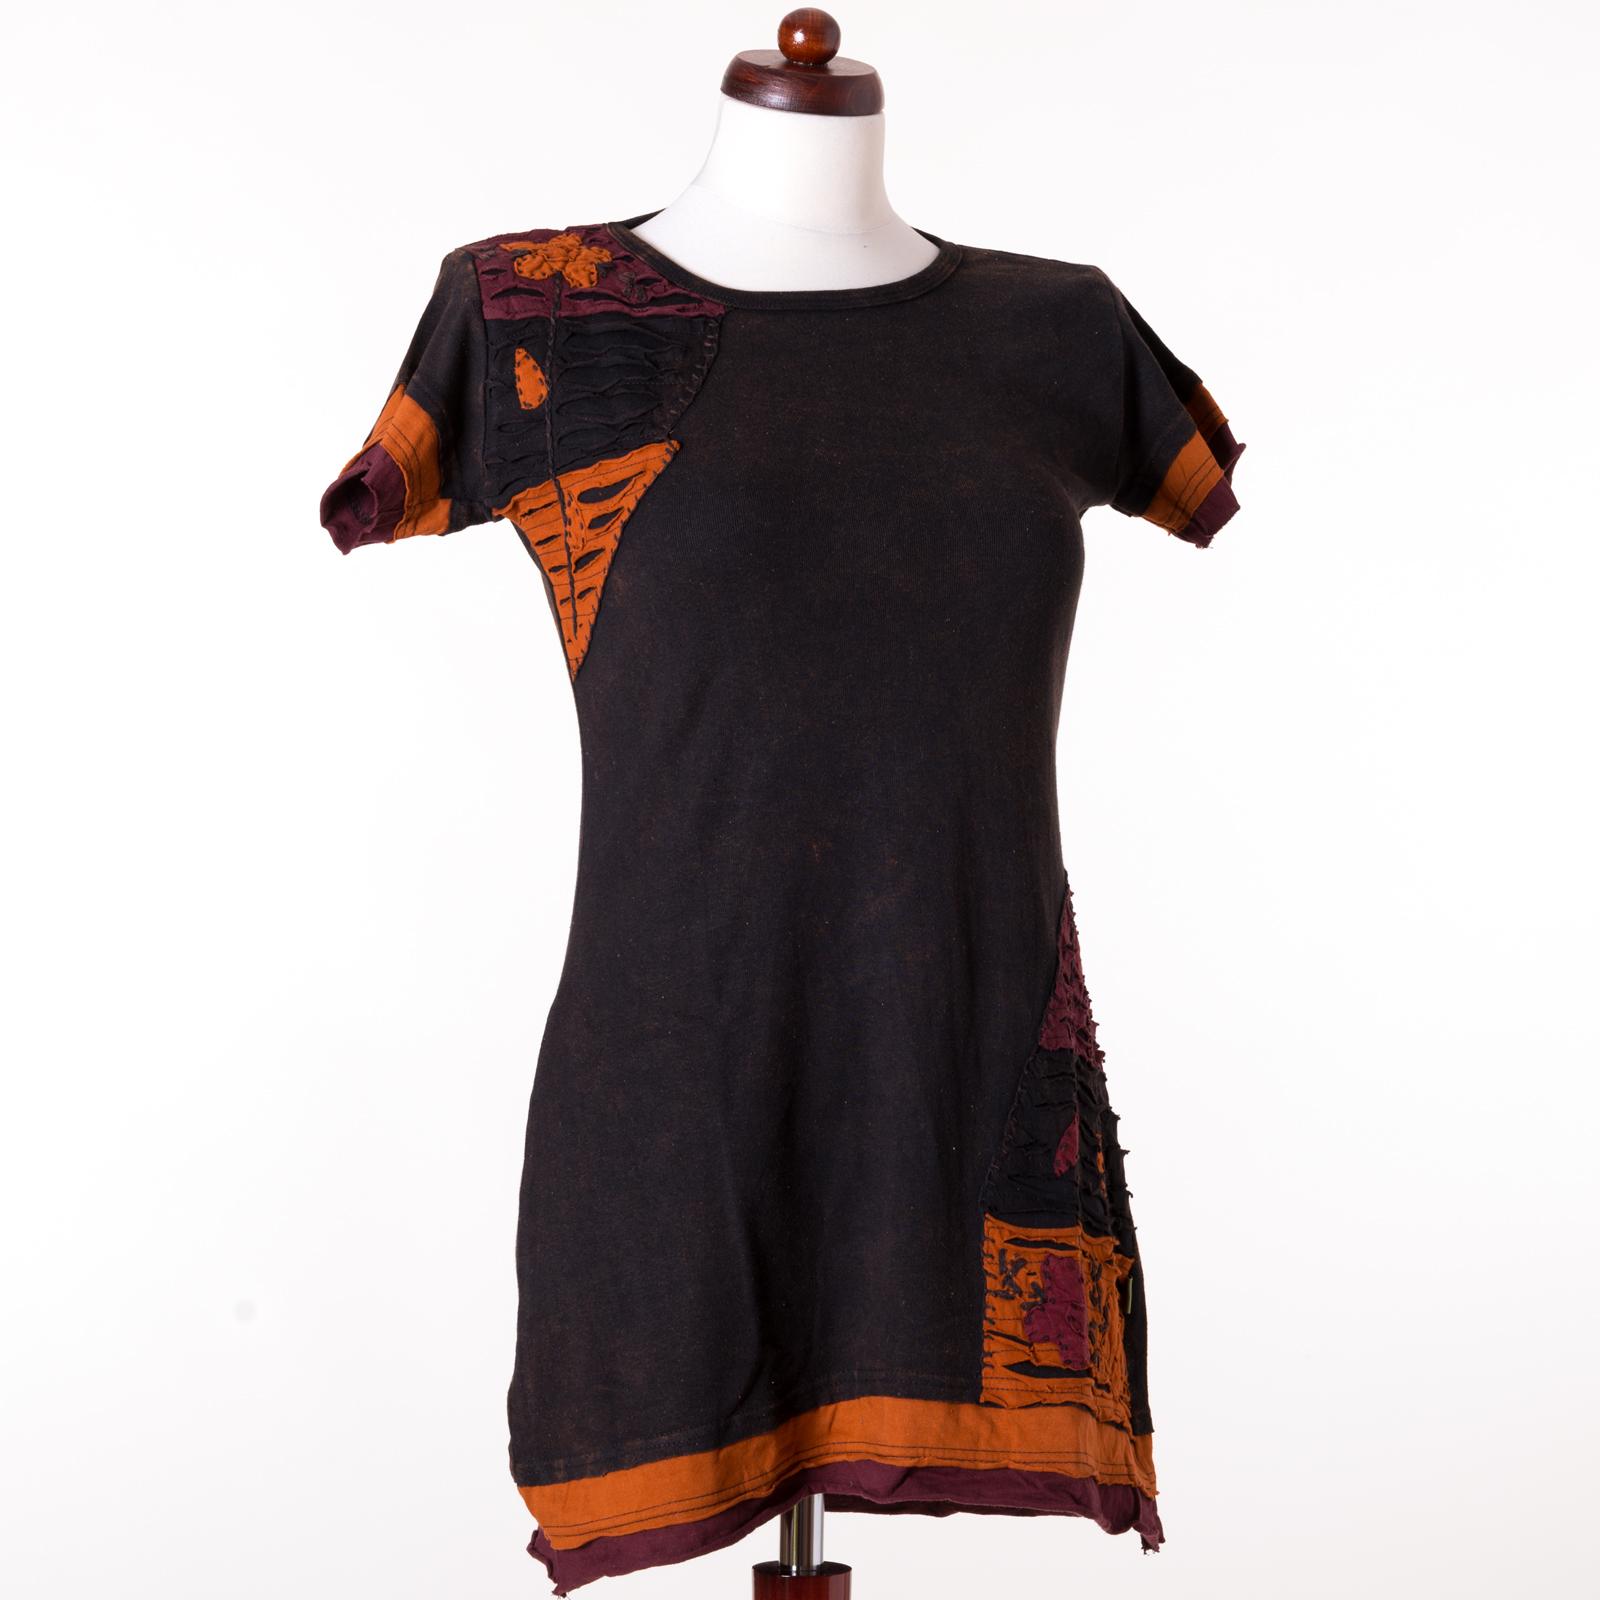 vishes hippie goa tunika super mini kleid boho chic. Black Bedroom Furniture Sets. Home Design Ideas